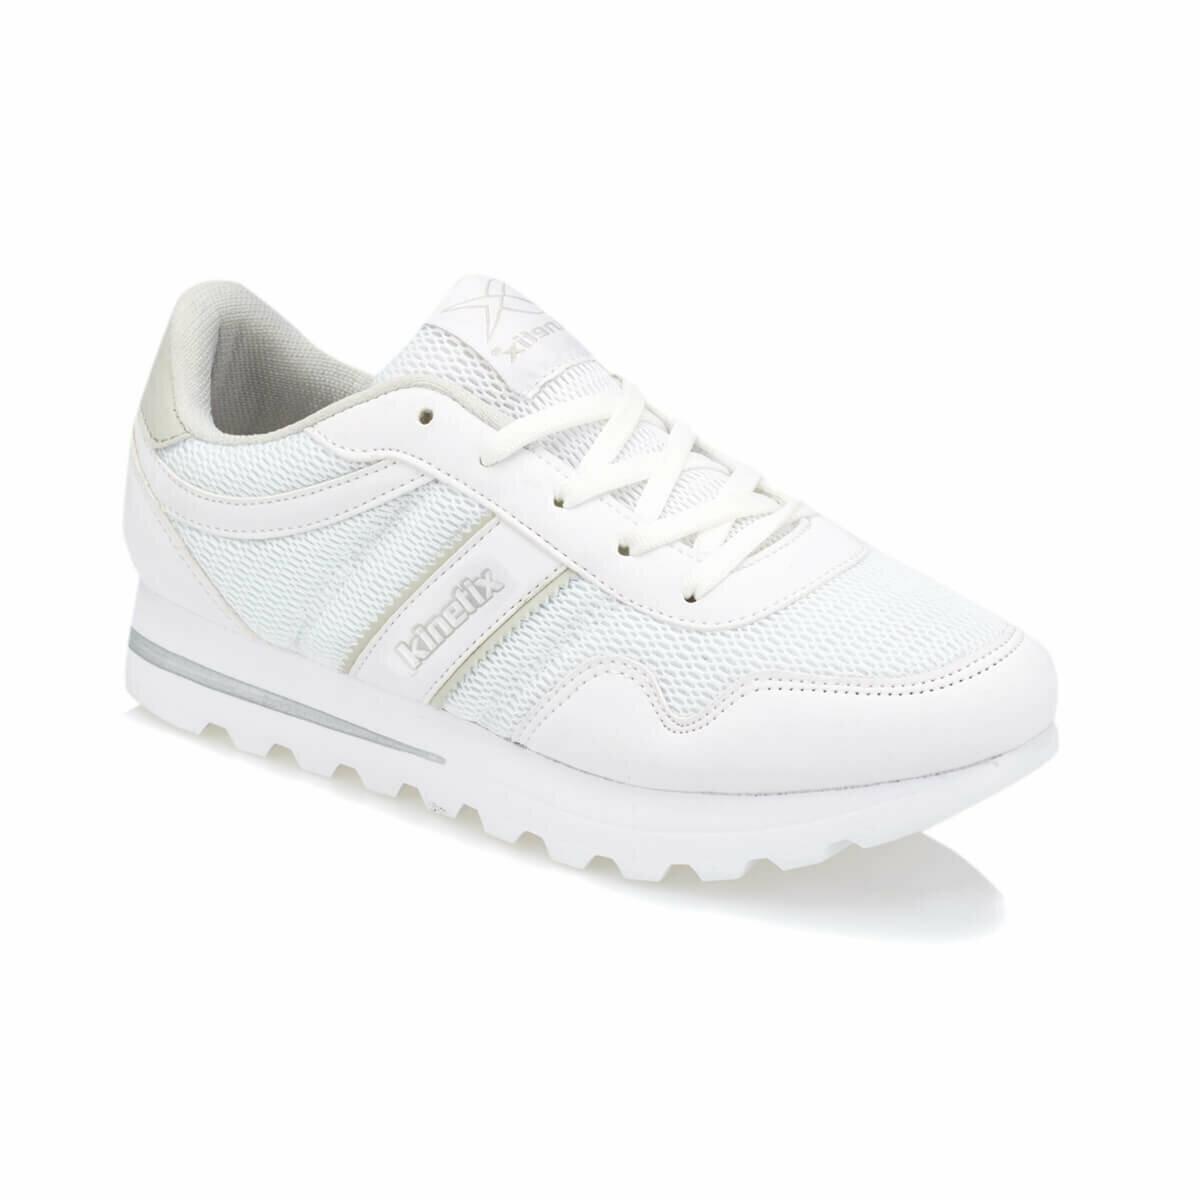 FLO GIAN TX W White Women 'S Sneaker Shoes KINETIX